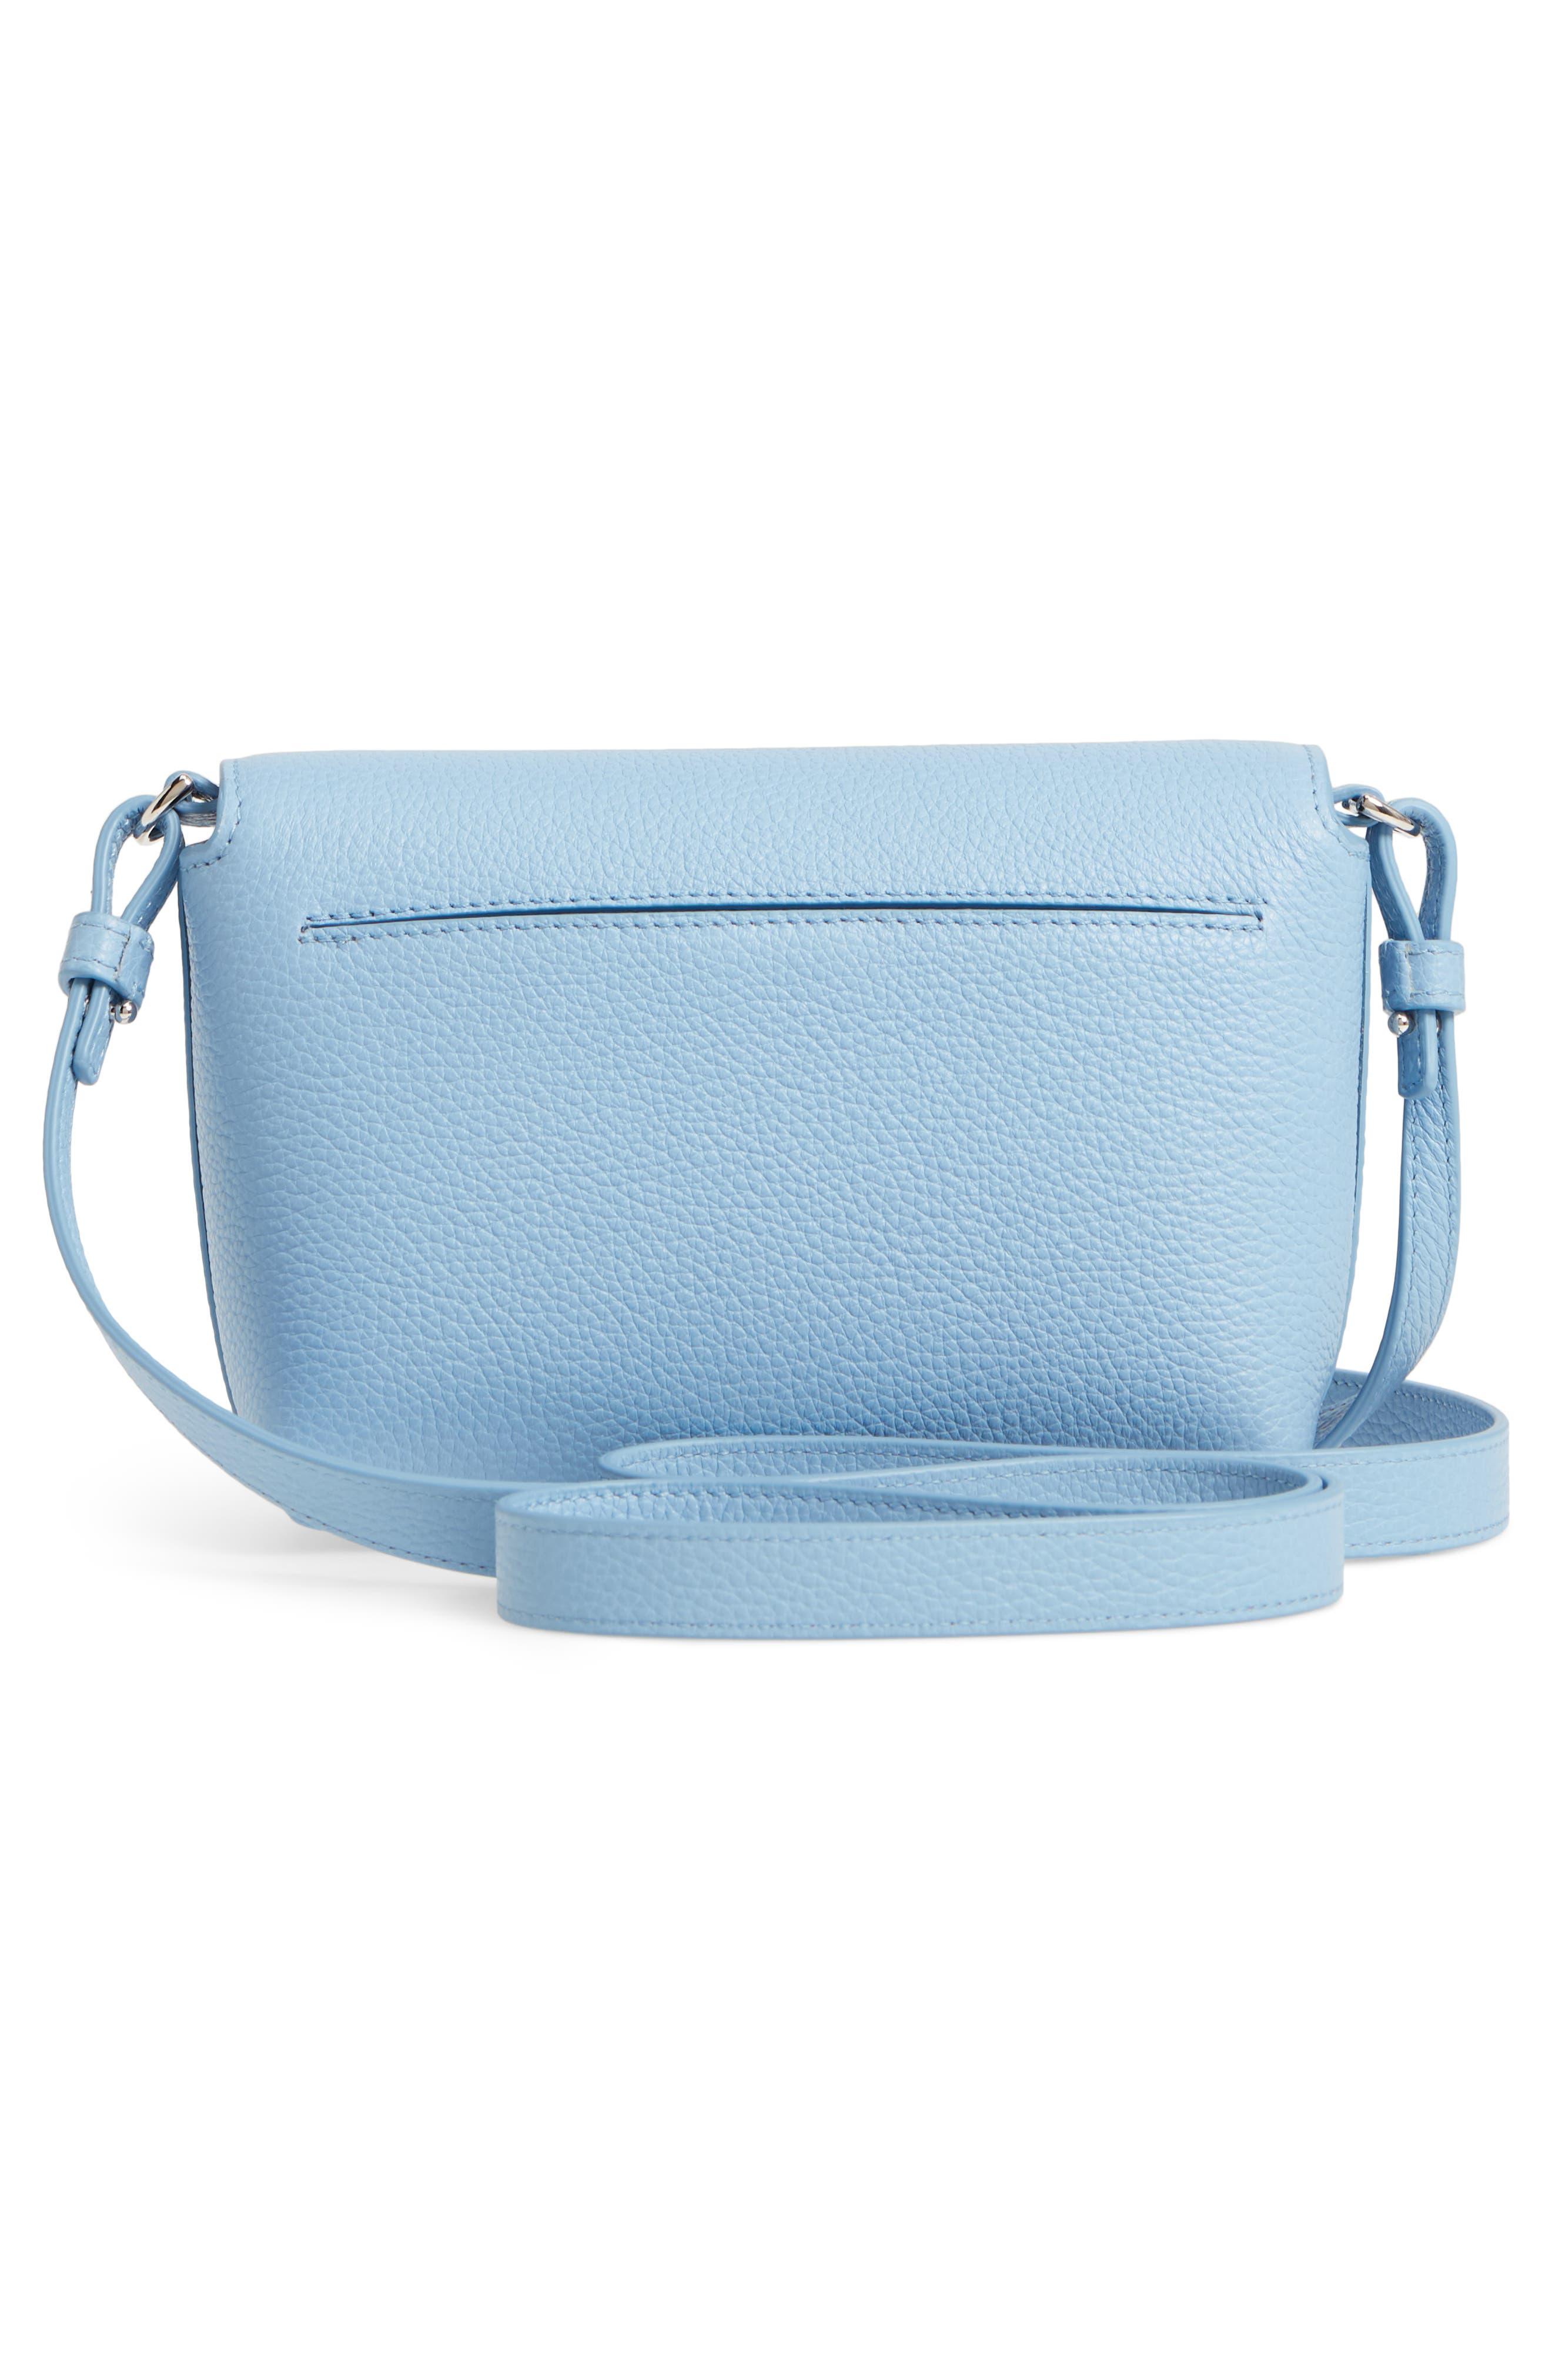 Little Anouk Calfskin Crossbody Bag,                             Alternate thumbnail 4, color,                             POWDER BLUE